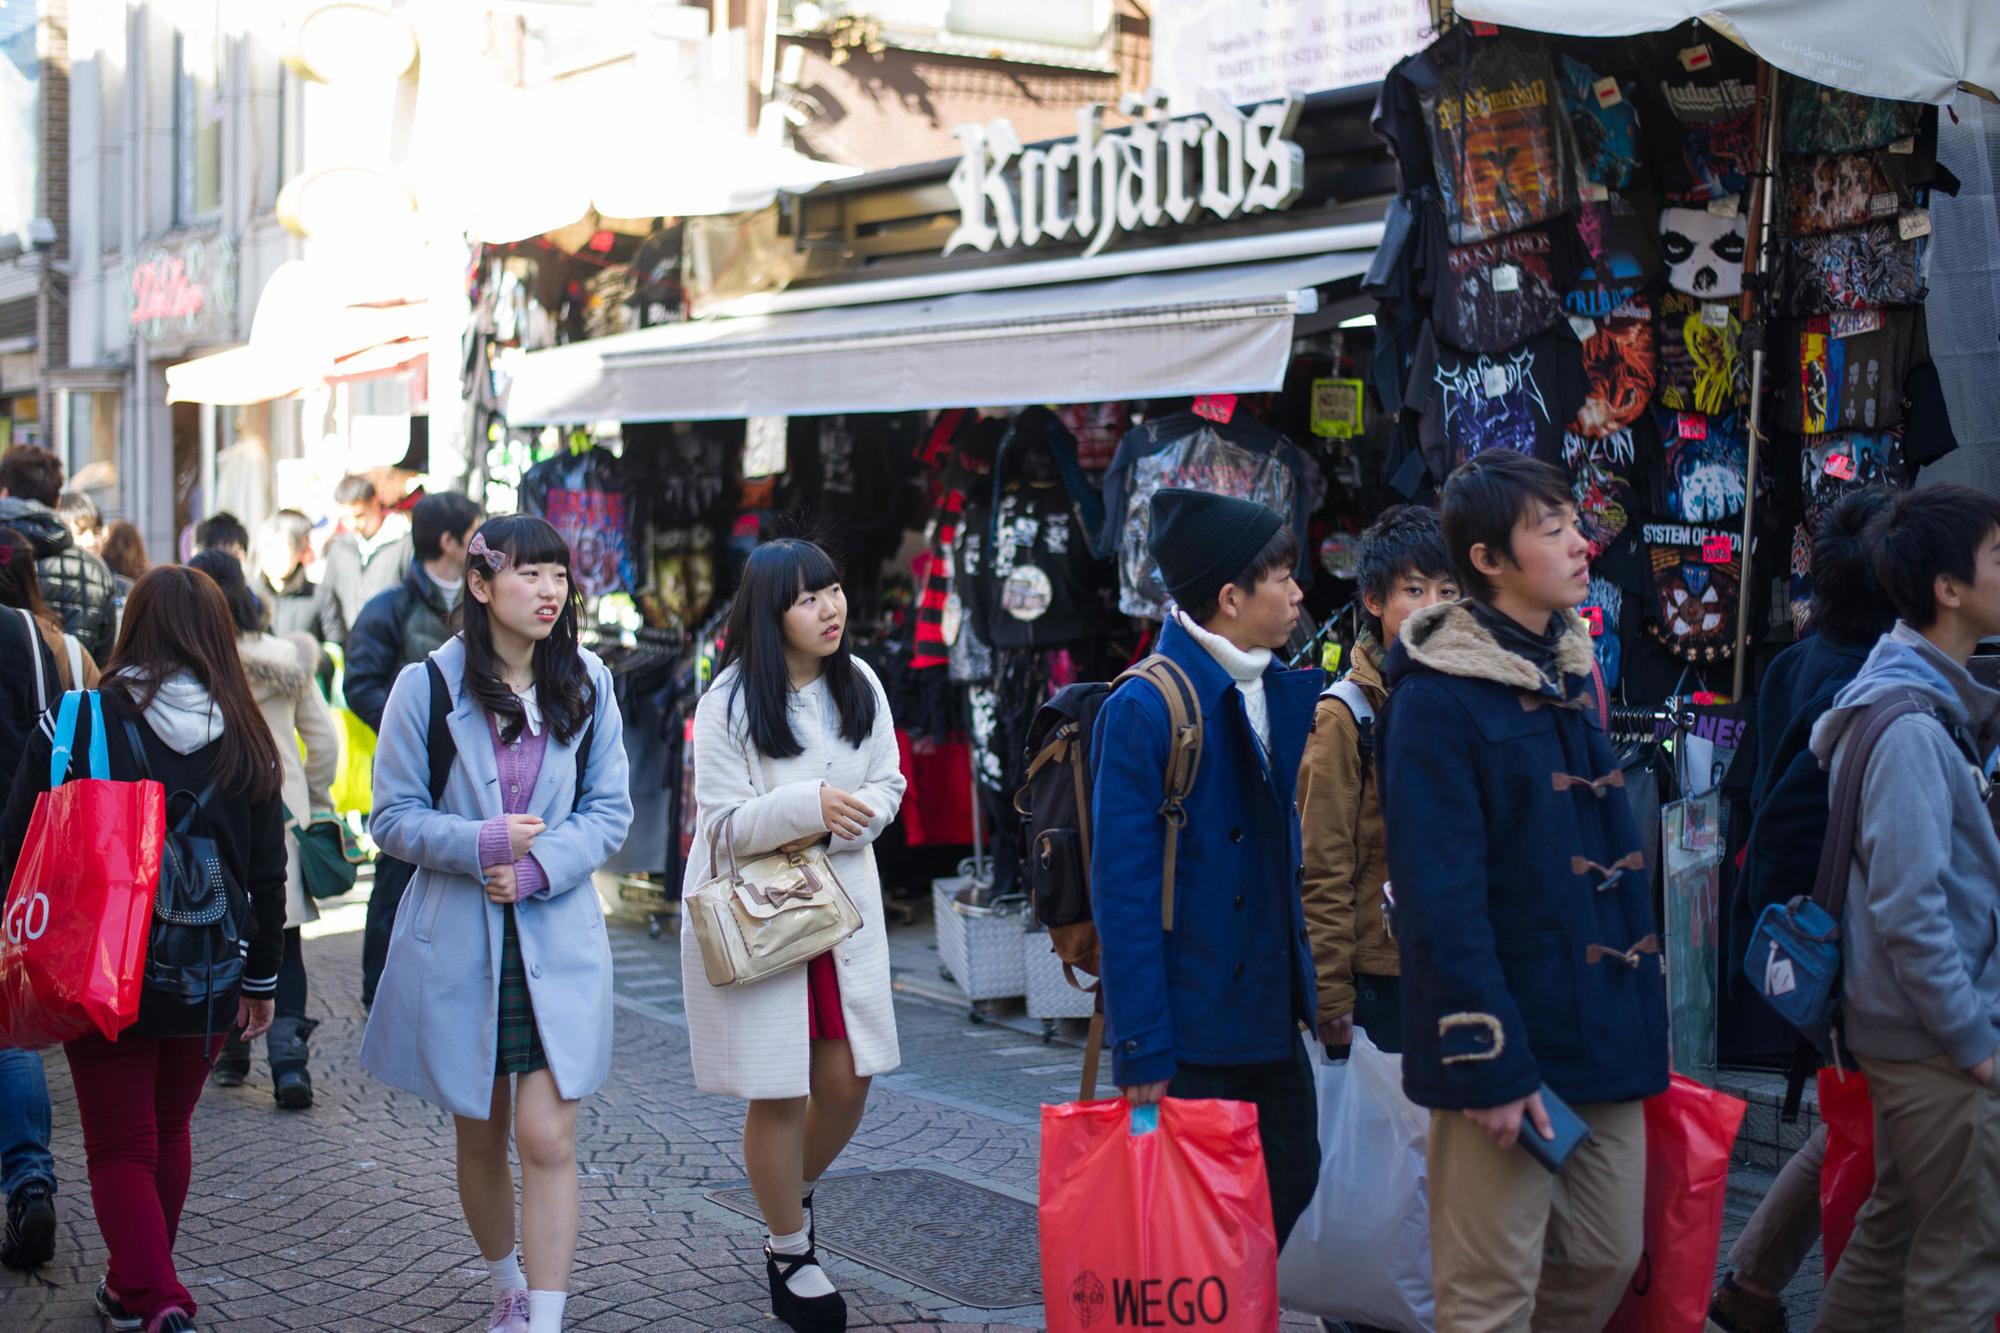 Street scene in Shibuya, Tokyo.